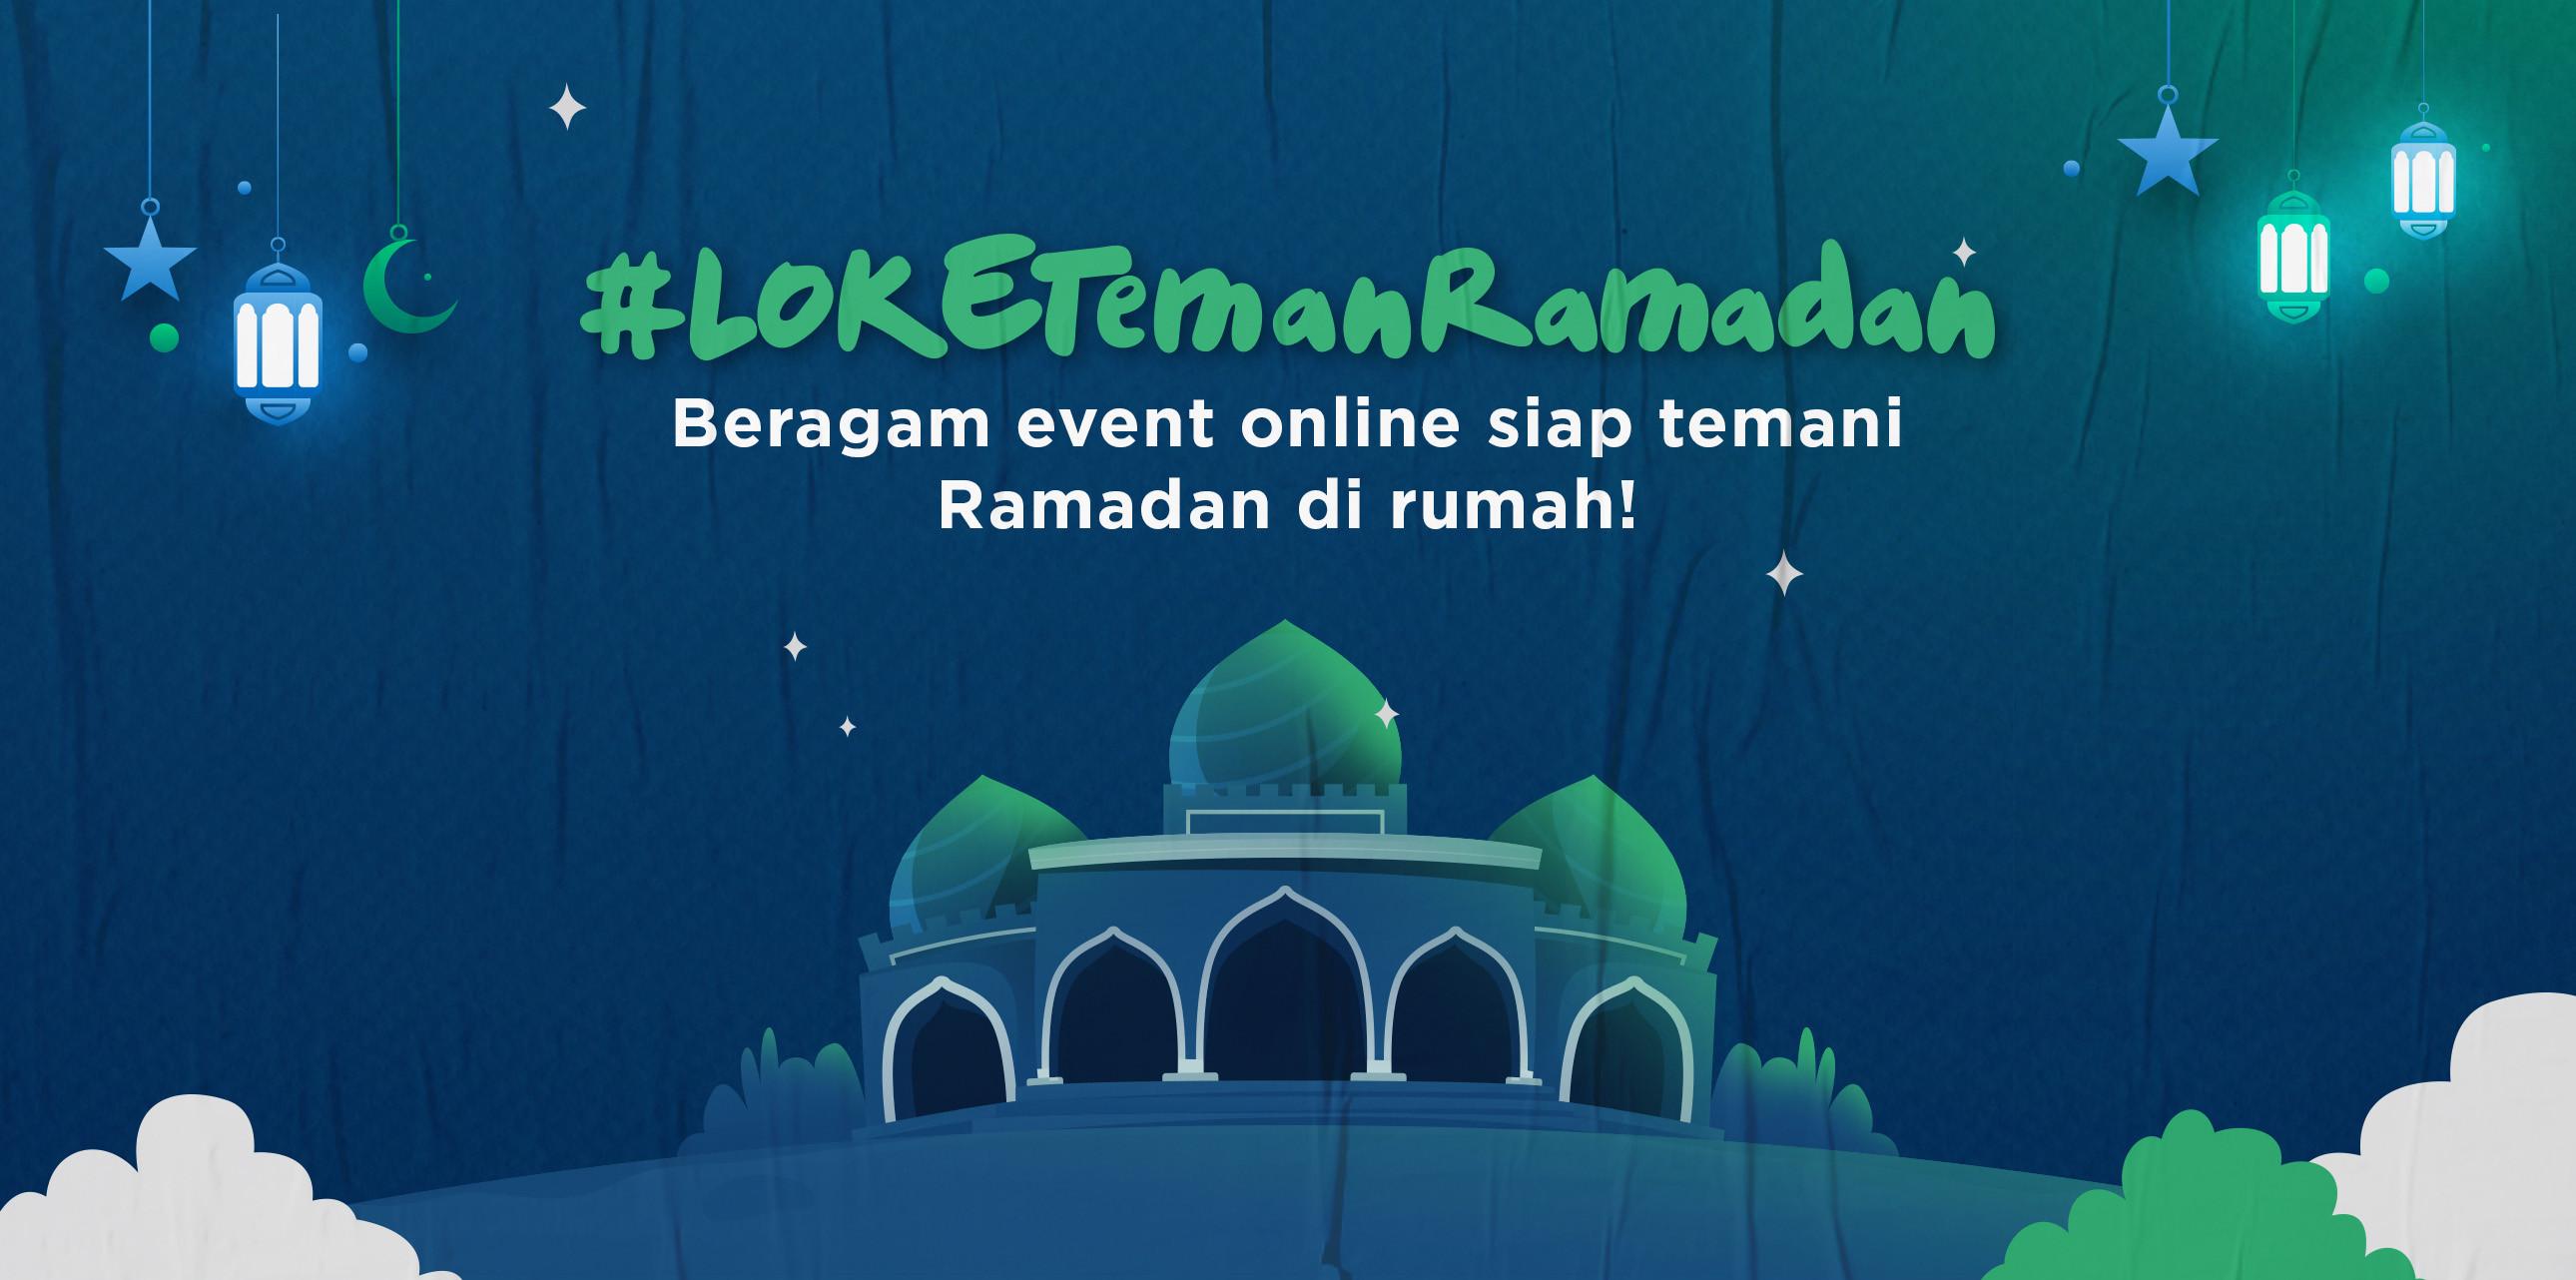 Teman Ramadan